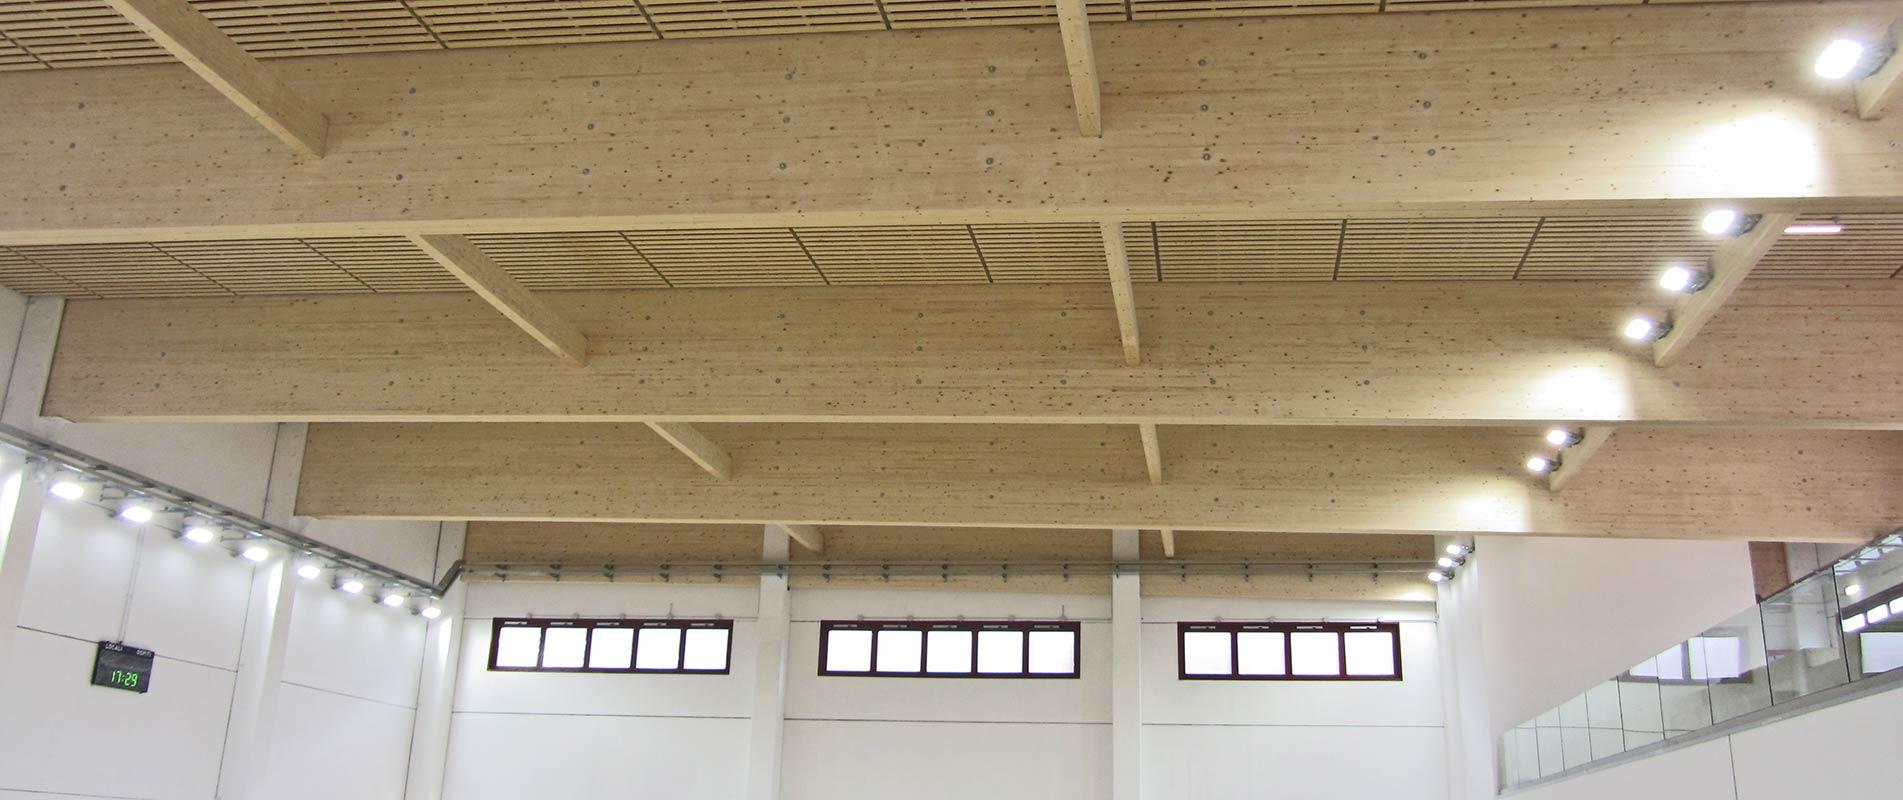 Palestre In Legno Prezzi case in legno, case in bioedilizia, coperture in legno